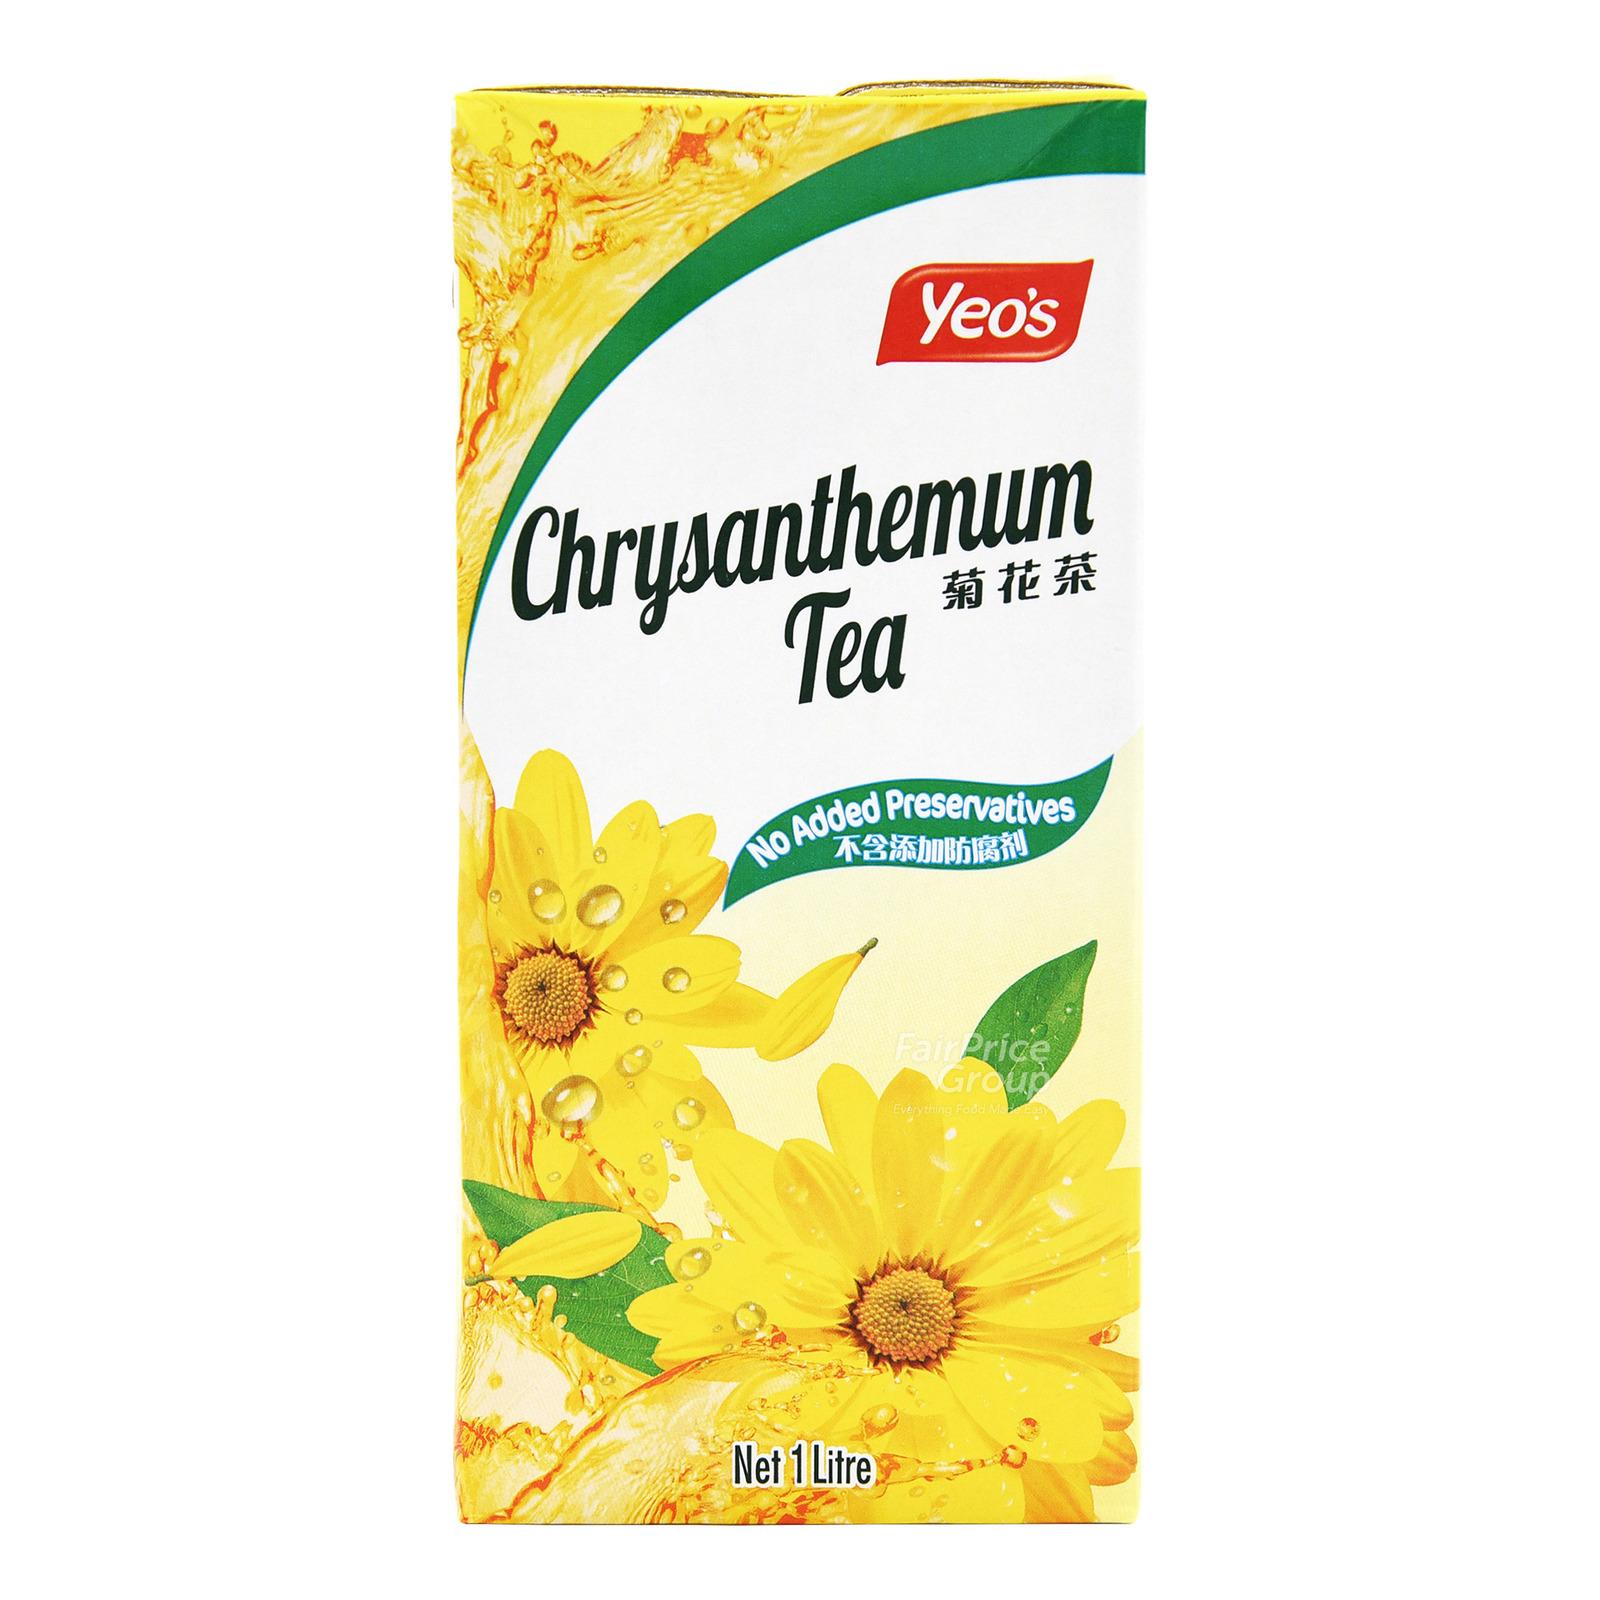 Yeo's Drink - Chrysanthemum Tea